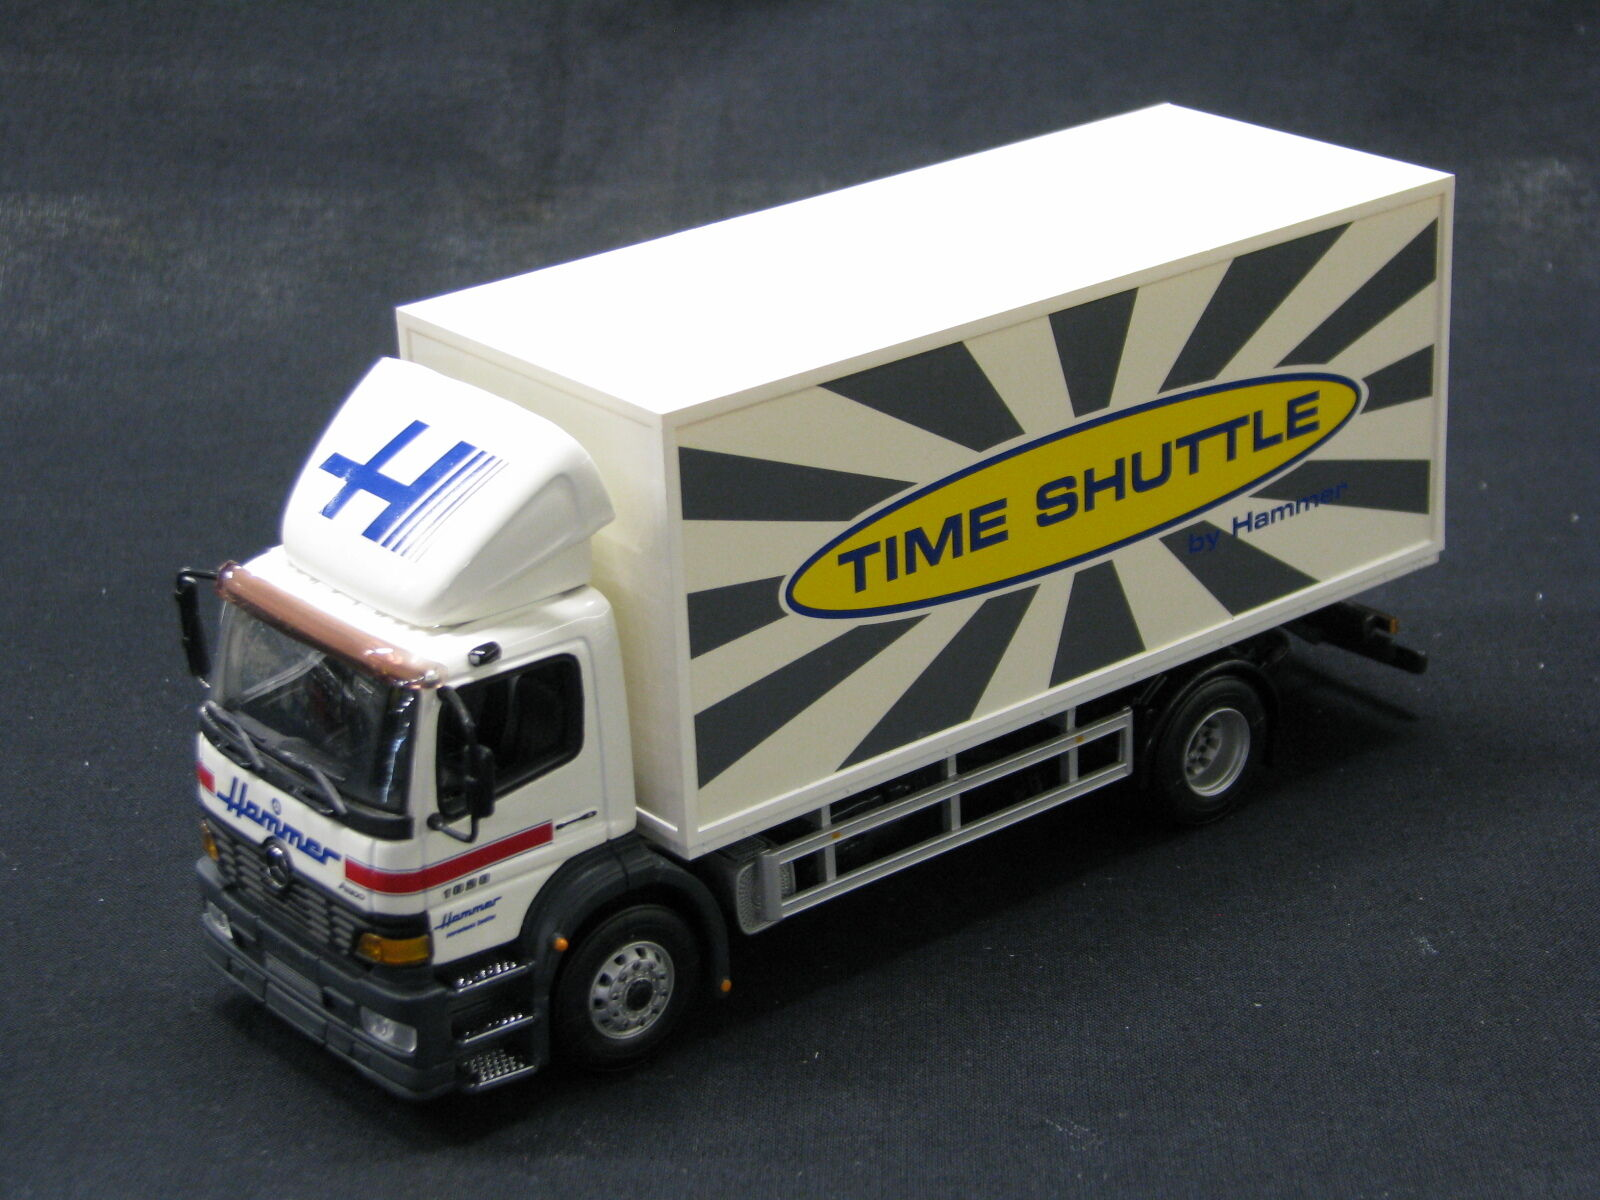 Minichamps Mercedes-Benz Atego 815 1 43  Time Shuttle  (JS)